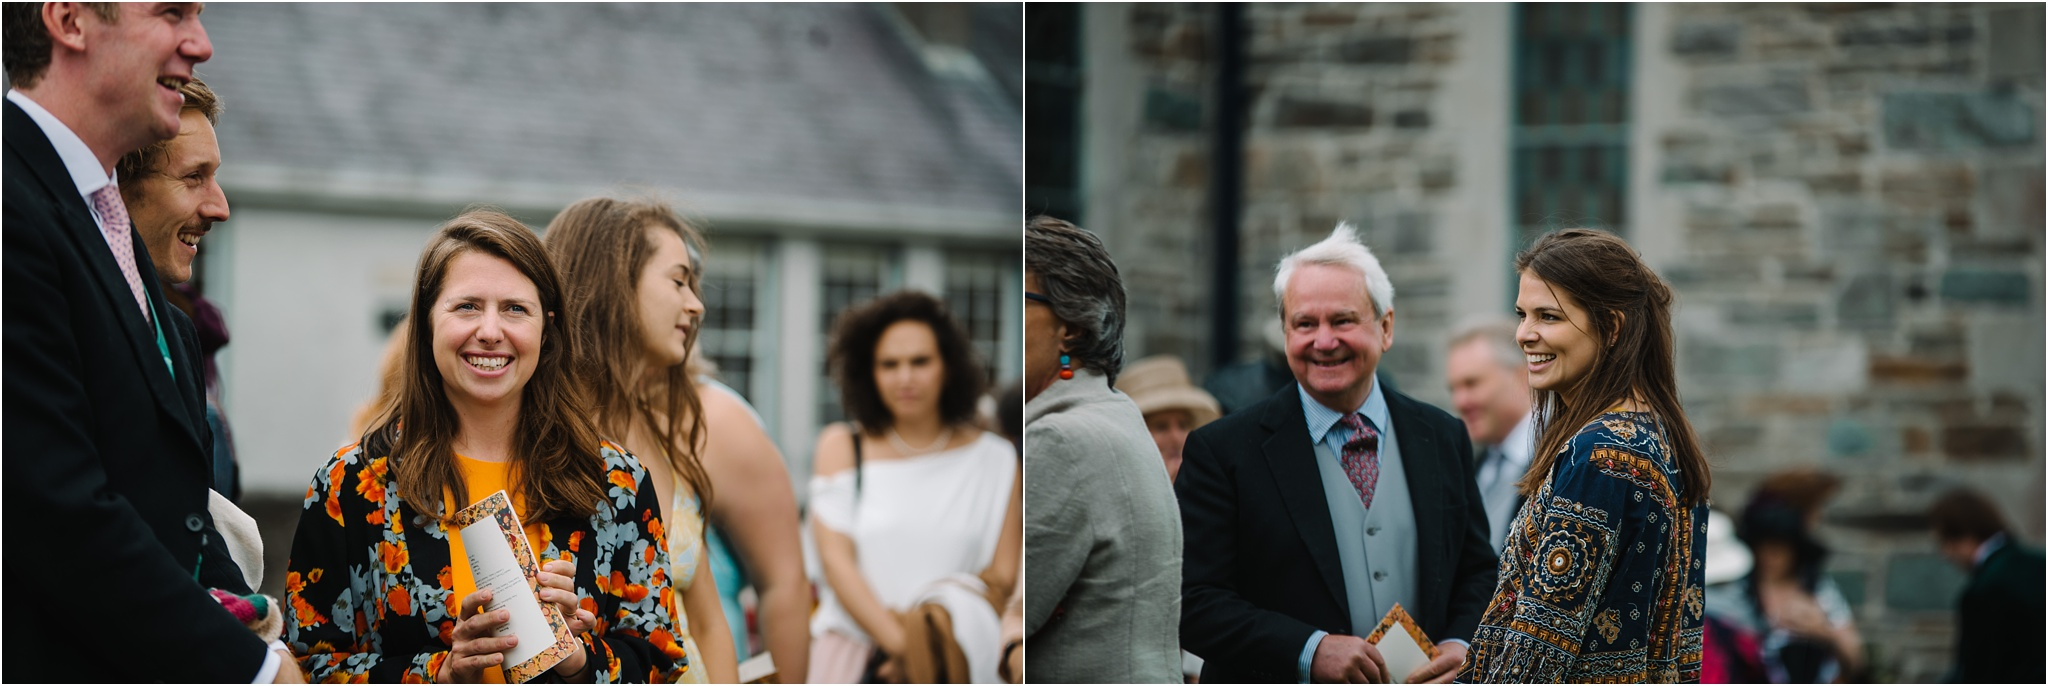 Outdoor-country-wedding-Edinburgh-photographer__0040.jpg